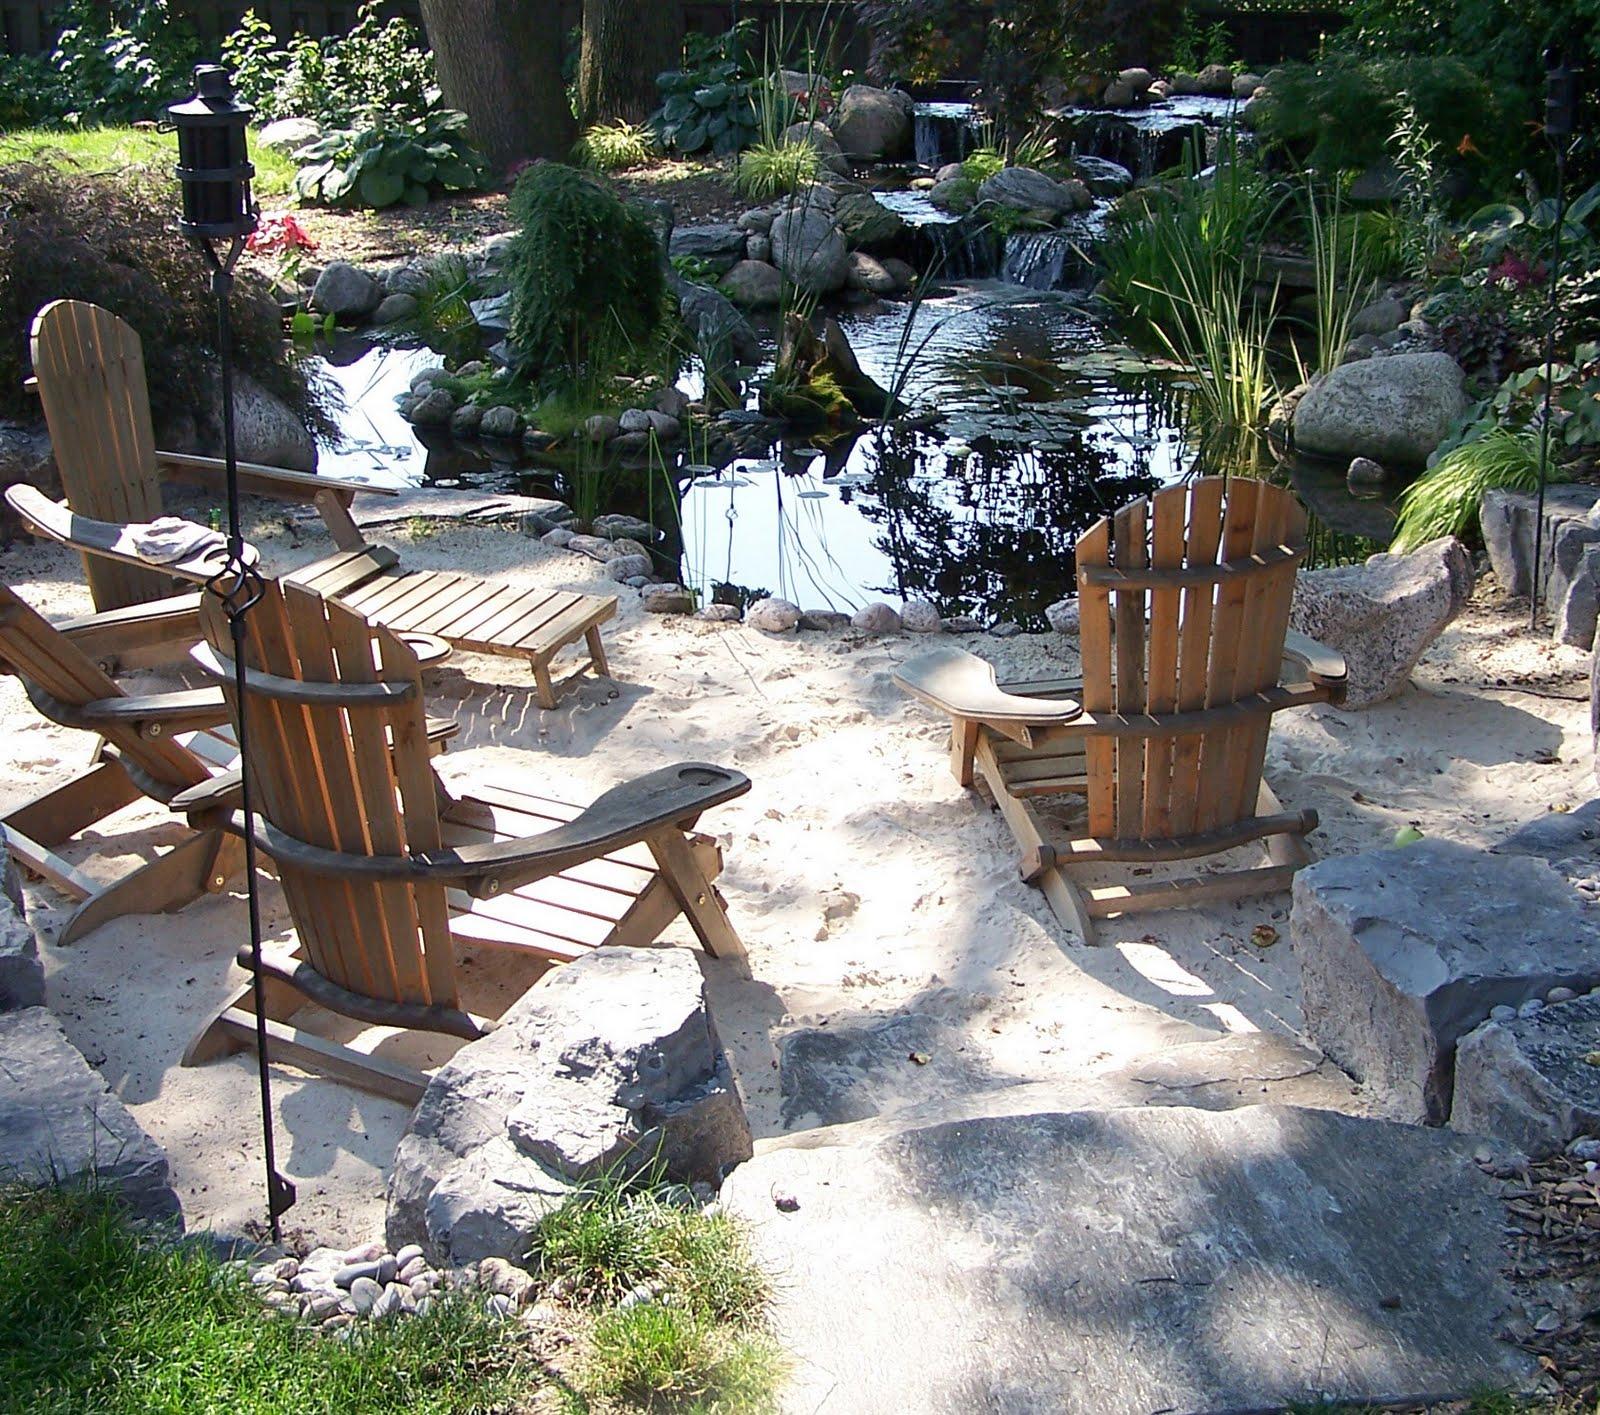 Three Dogs in a Garden: The Jason Garden, Mississauga Ontario